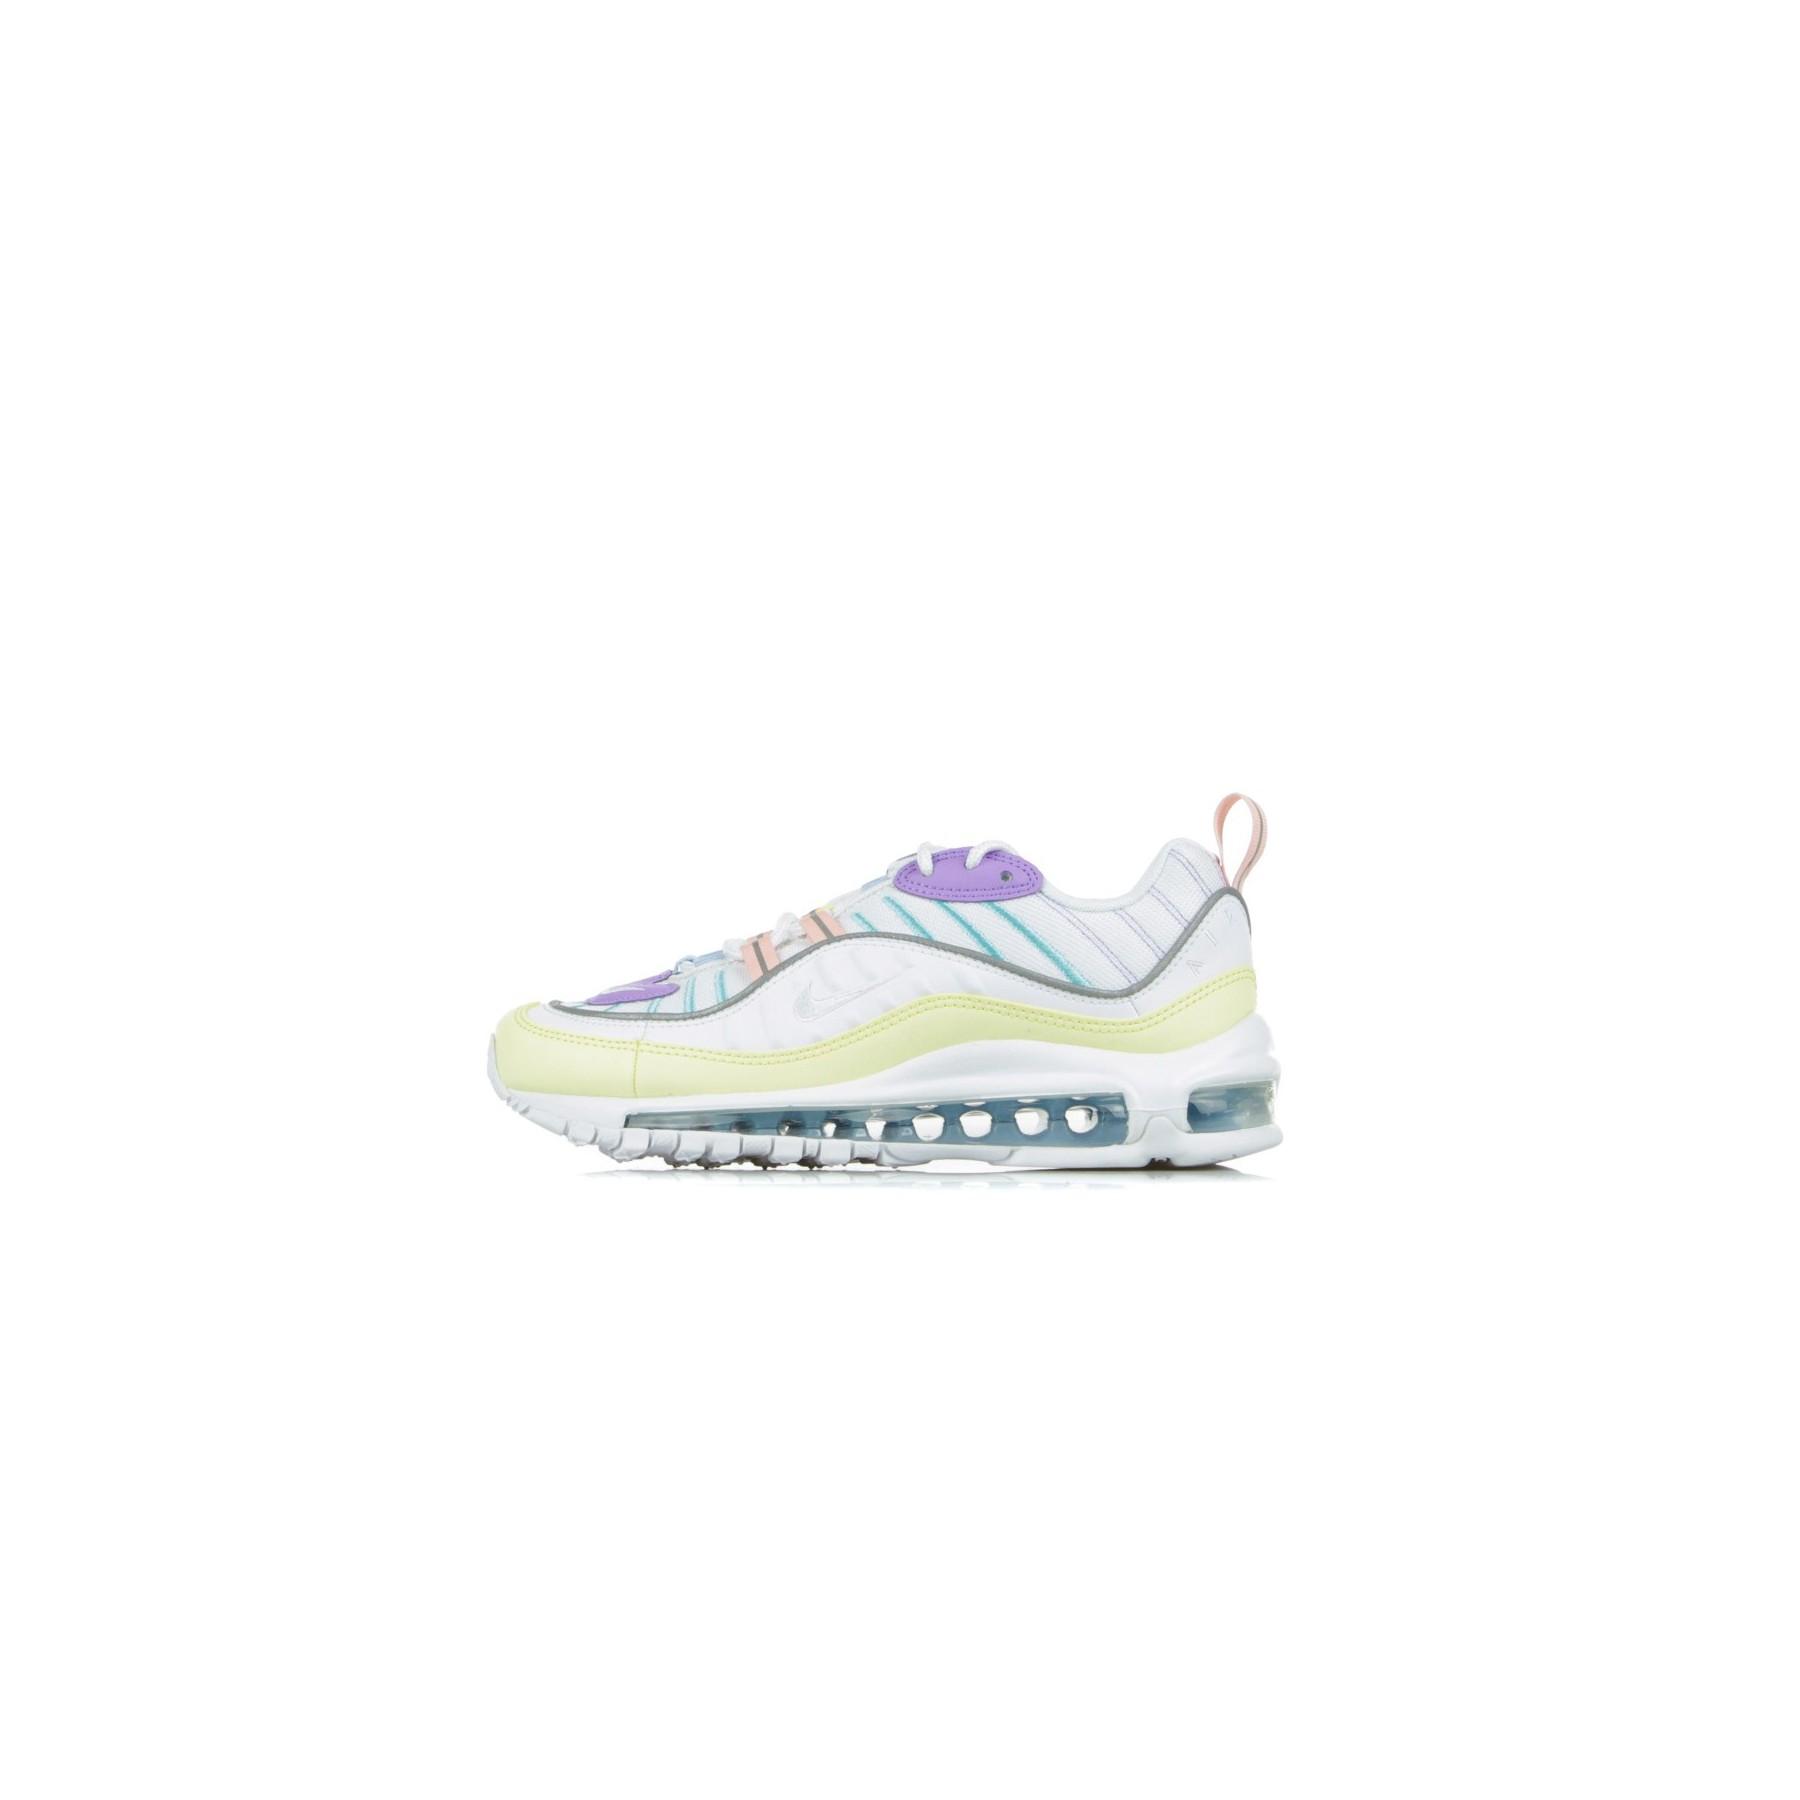 Nike Scarpa bassa donna w air max 98 AH6799-300 | Atipicishop.com